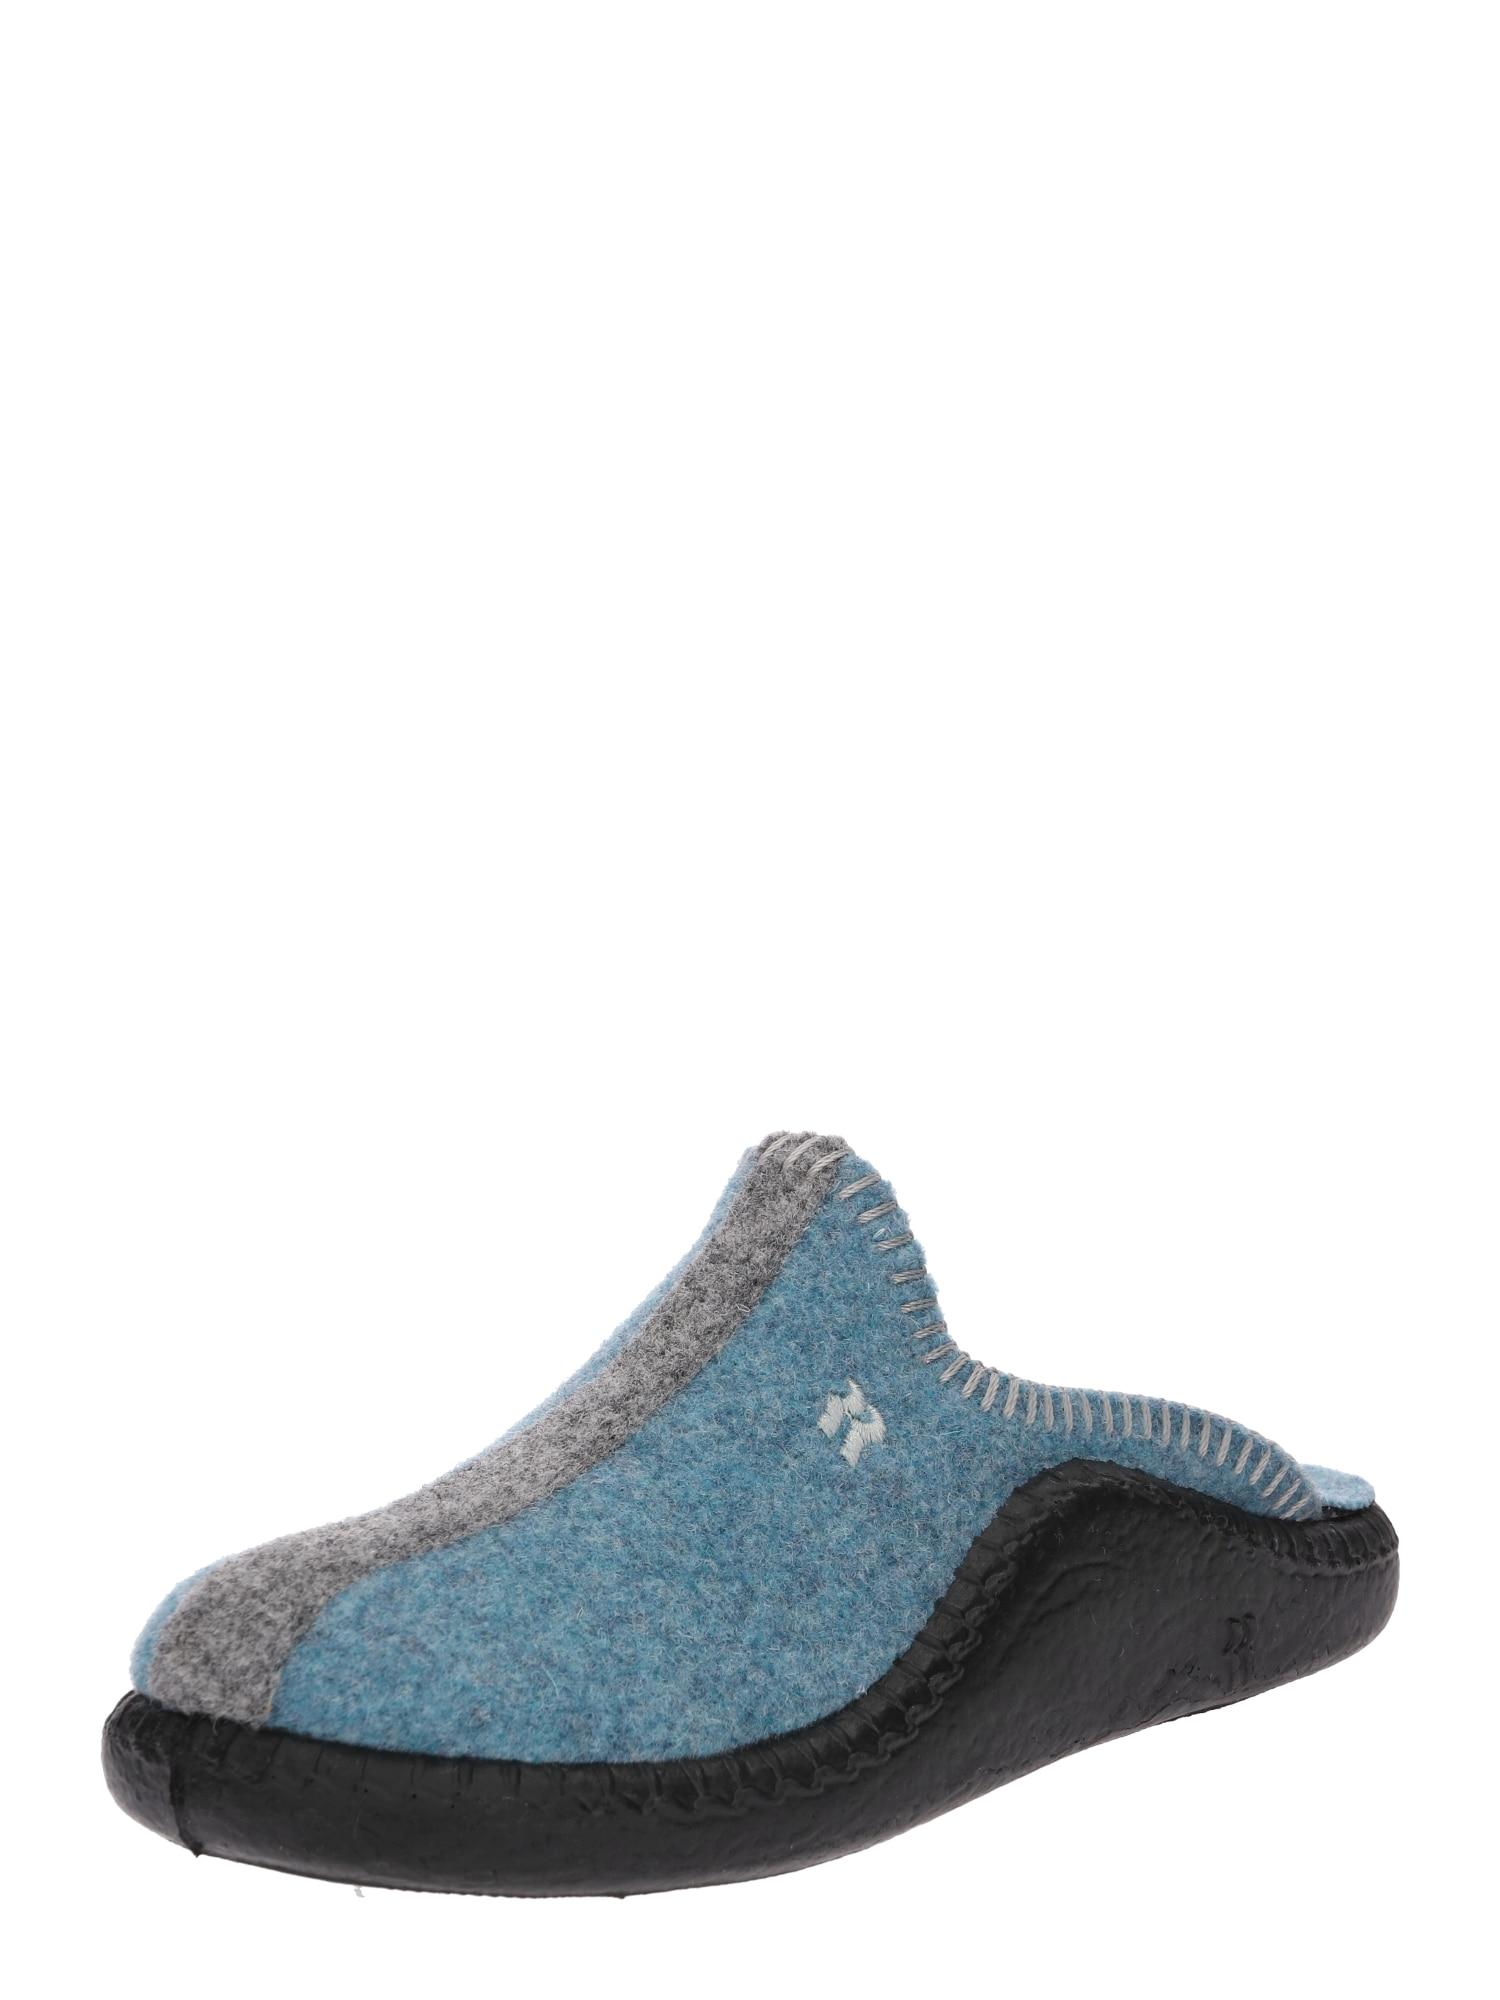 Pantofle Mokasso světlemodrá šedá ROMIKA